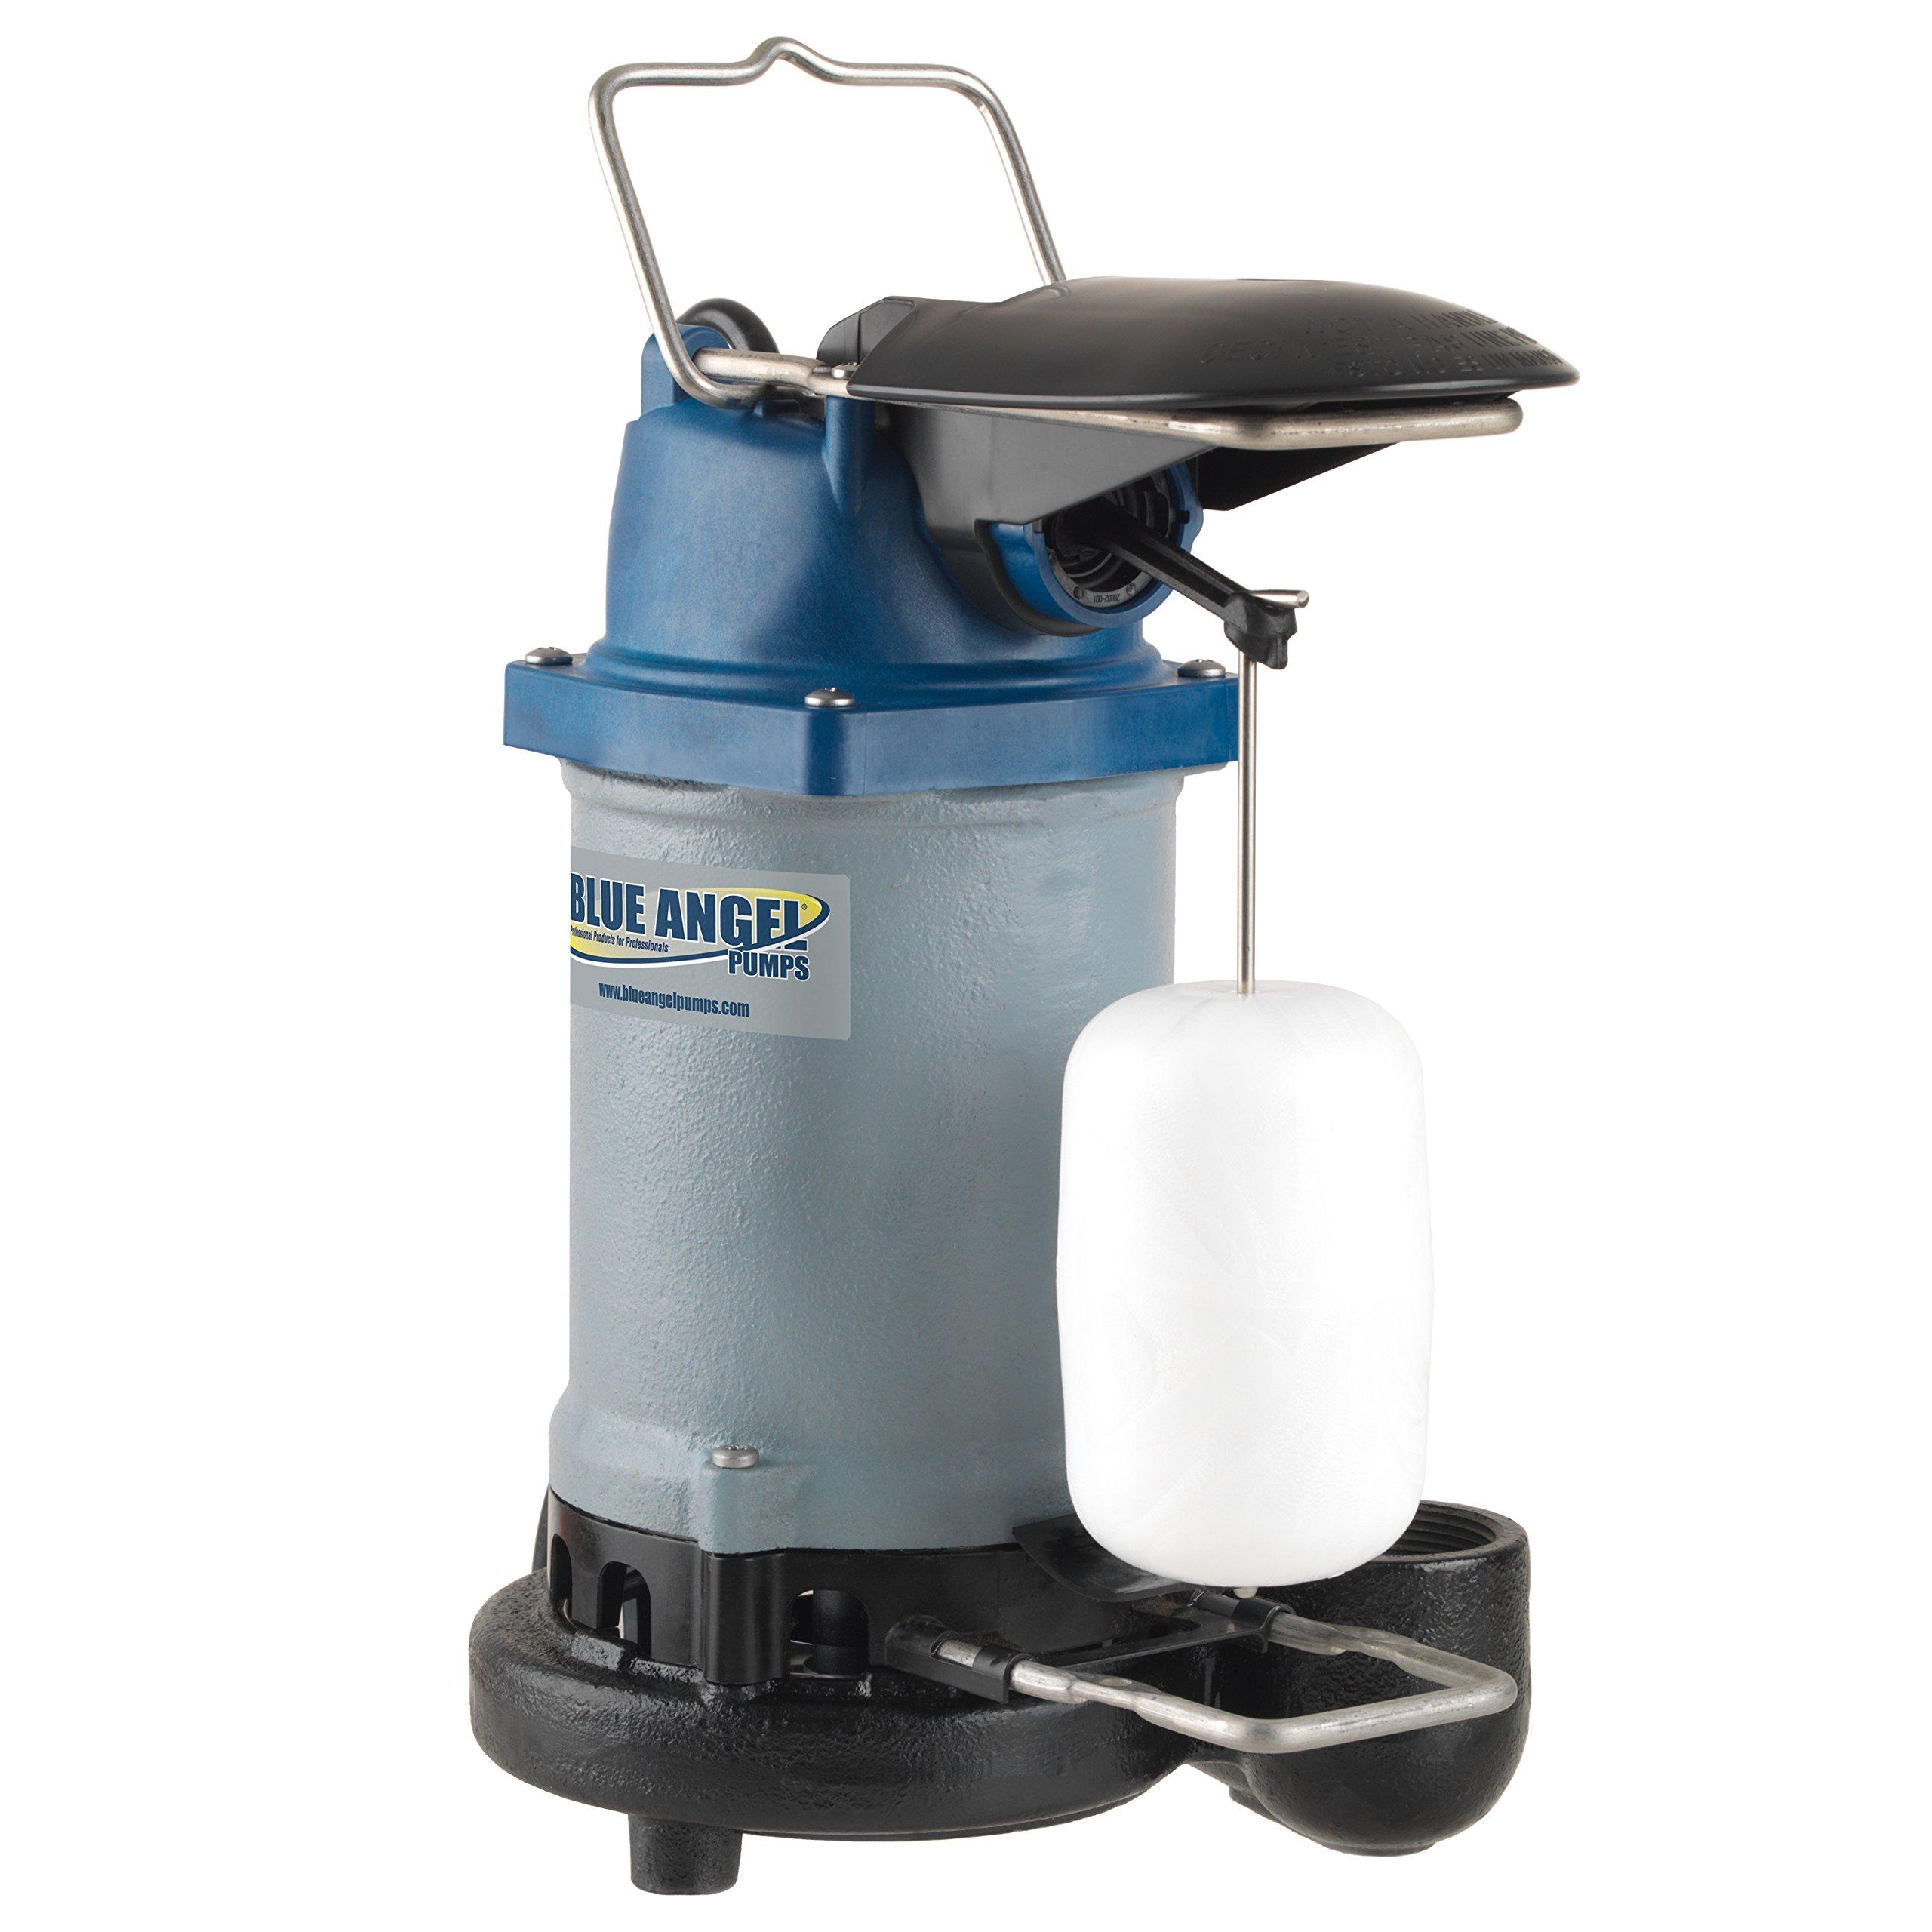 Blue Angel Pumps F50S 1/2 HP Professional Series Submersible Cast Iron Sump Pump